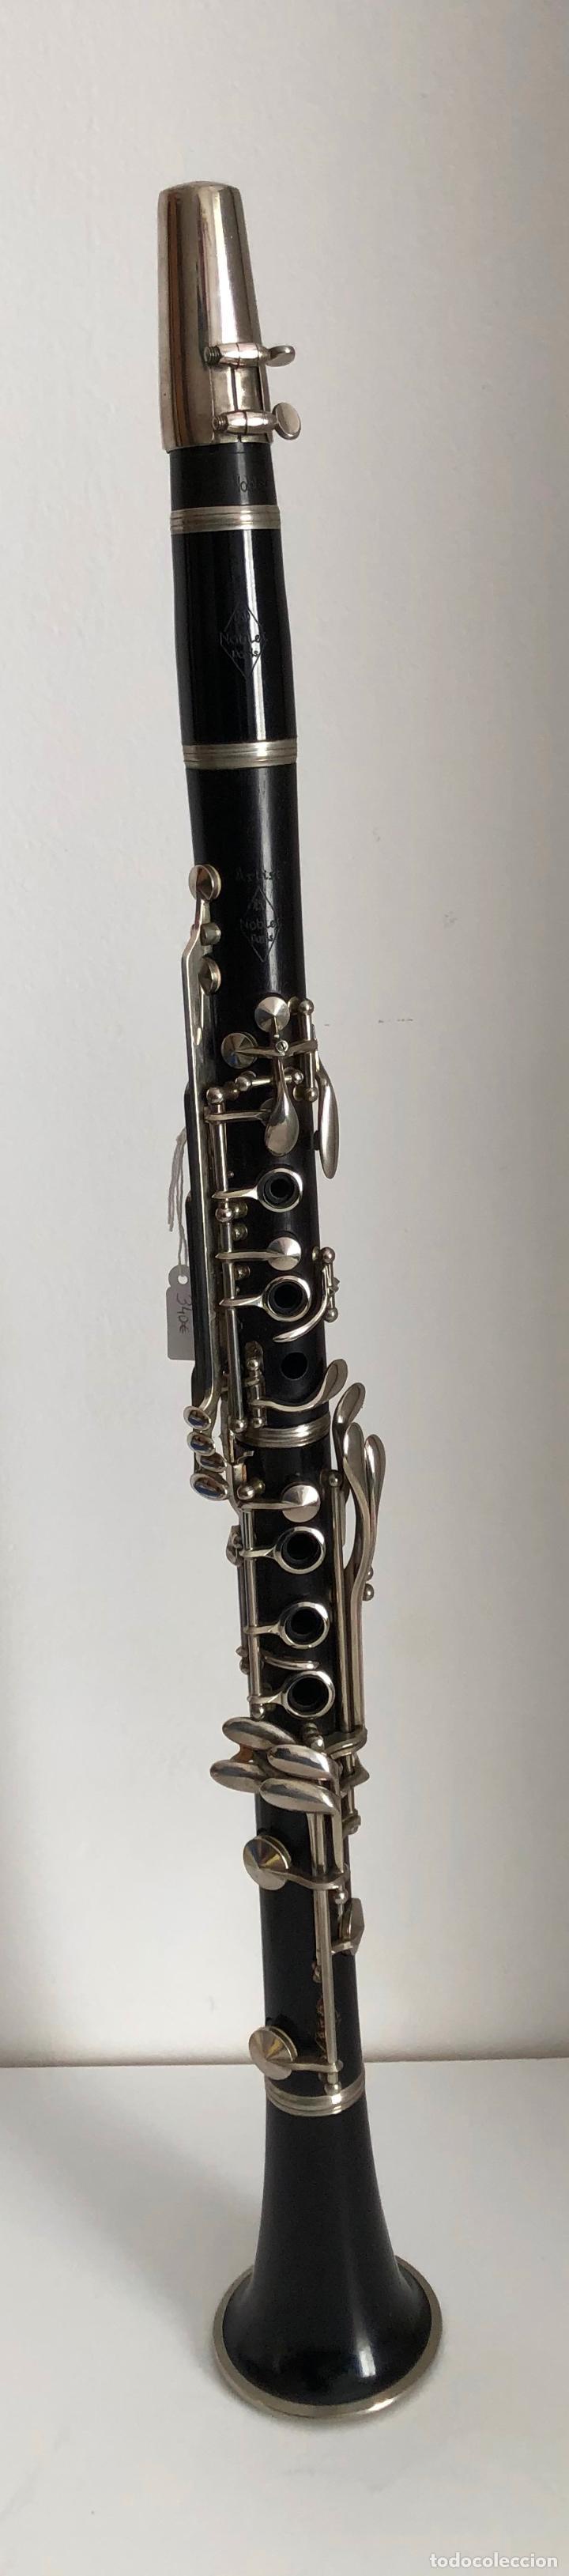 Instrumentos musicales: CLARINETE NOBLET PARIS - Foto 7 - 194878962